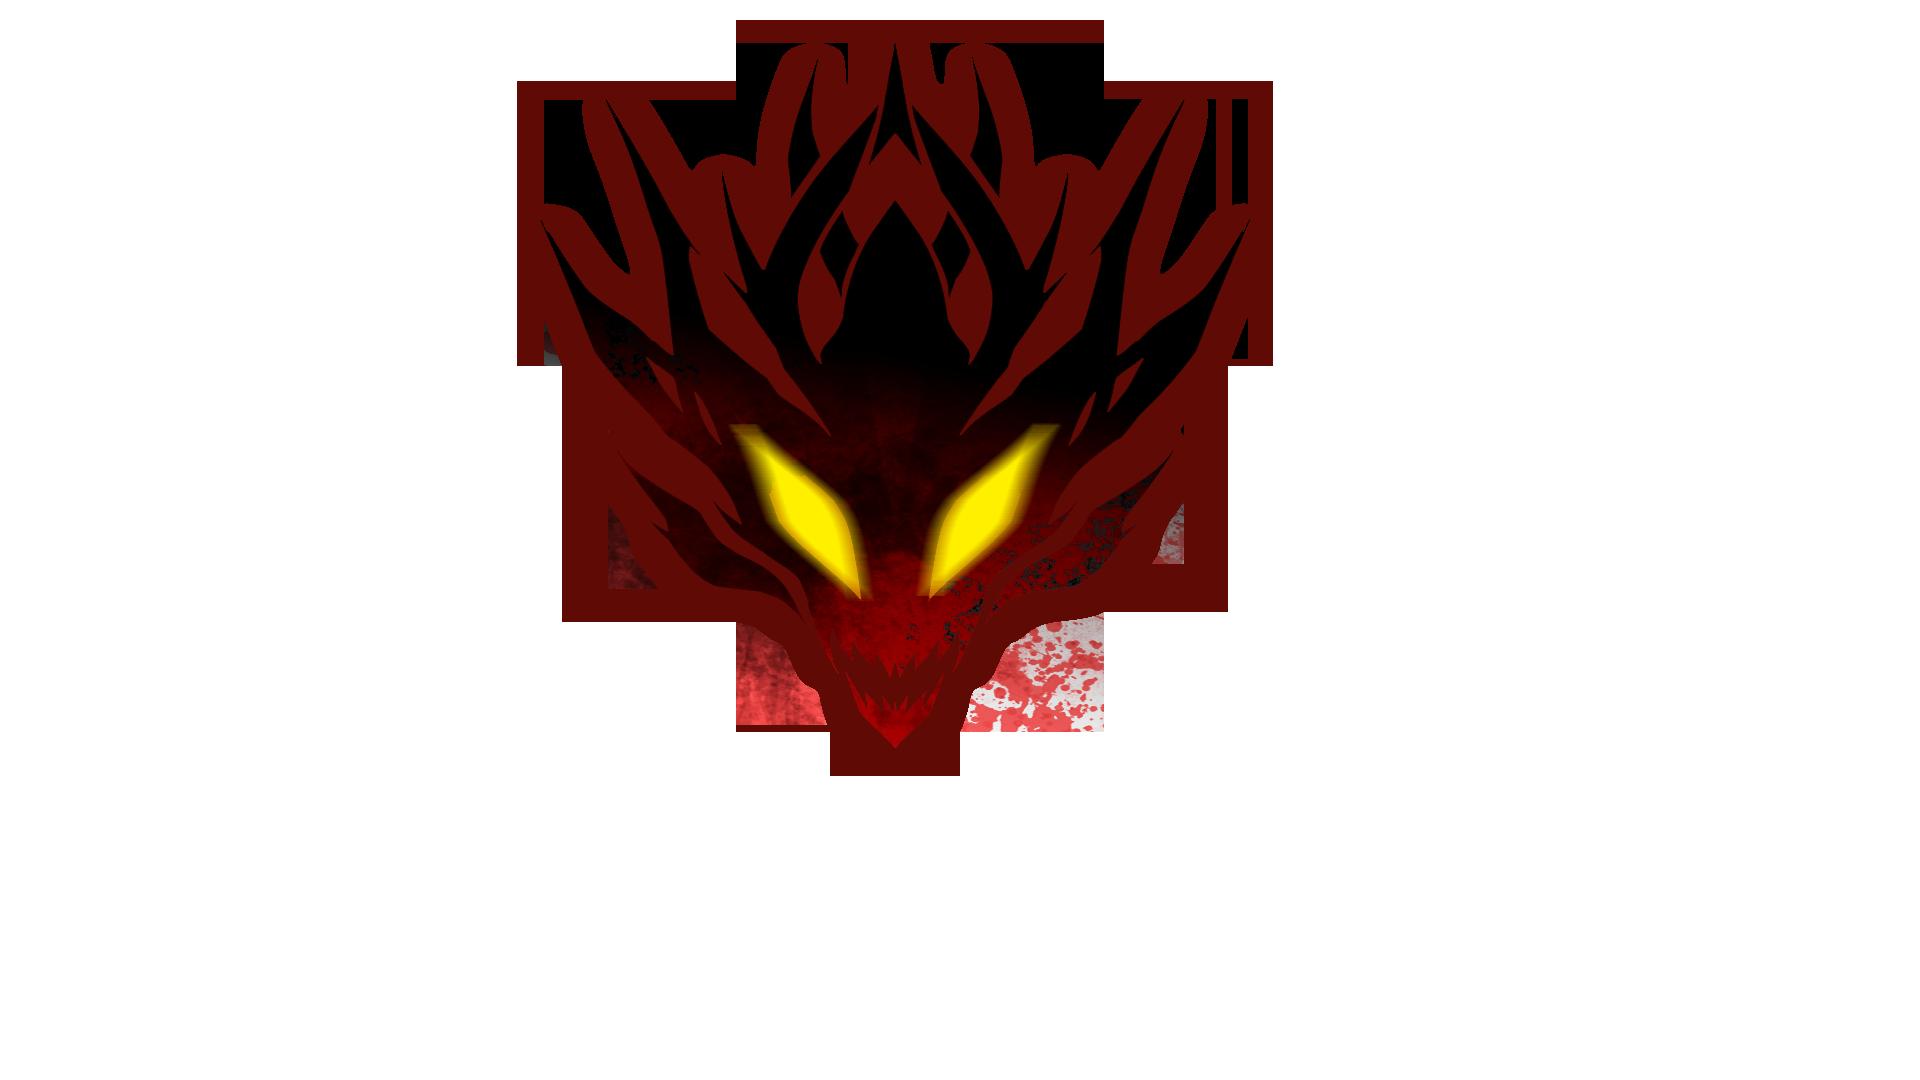 Boc Dragon Symbol By Cvsnb On Deviantart